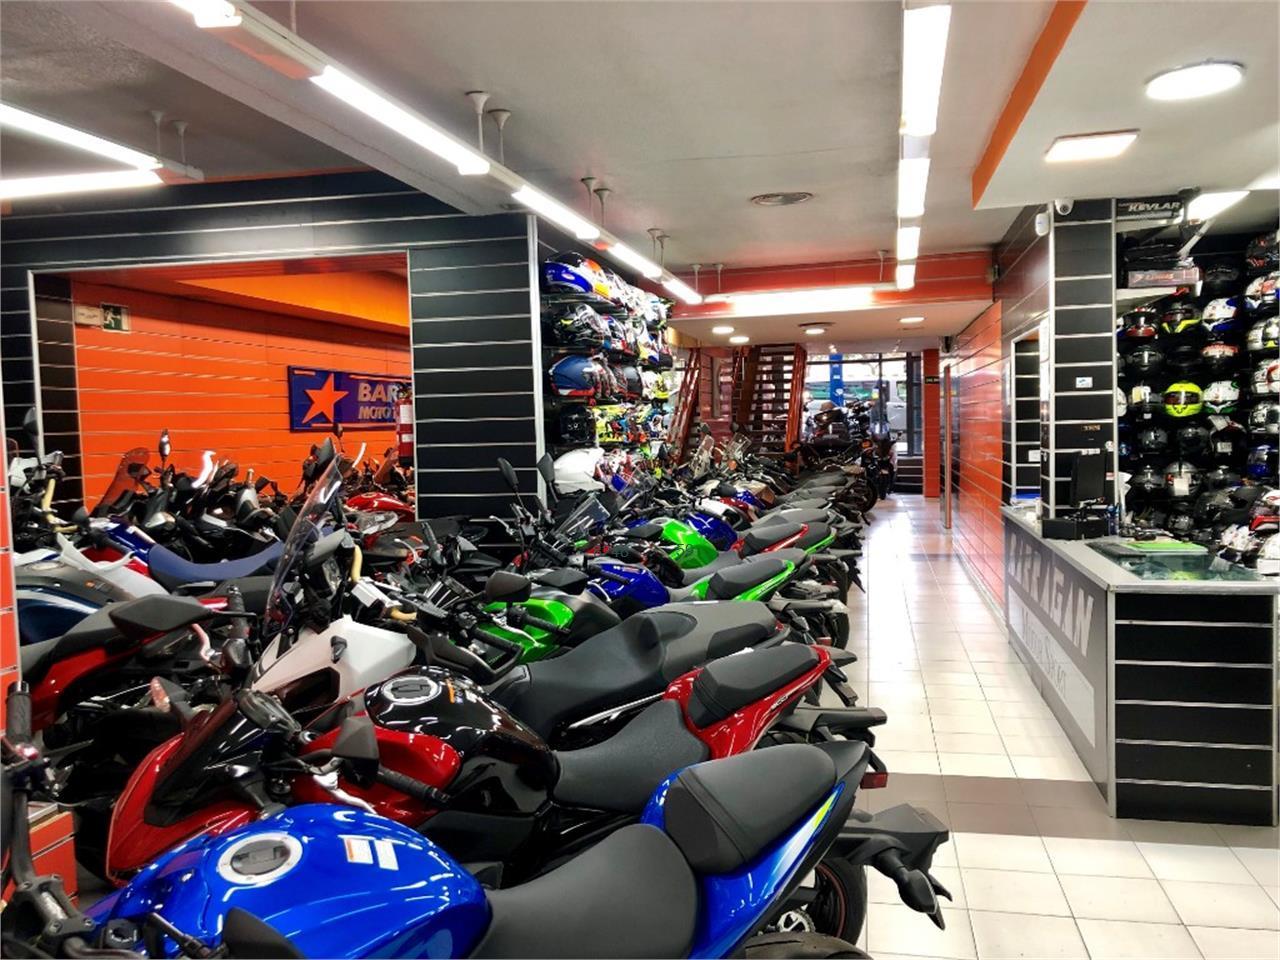 YAMAHA TMAX 530_4 de venta en Madrid